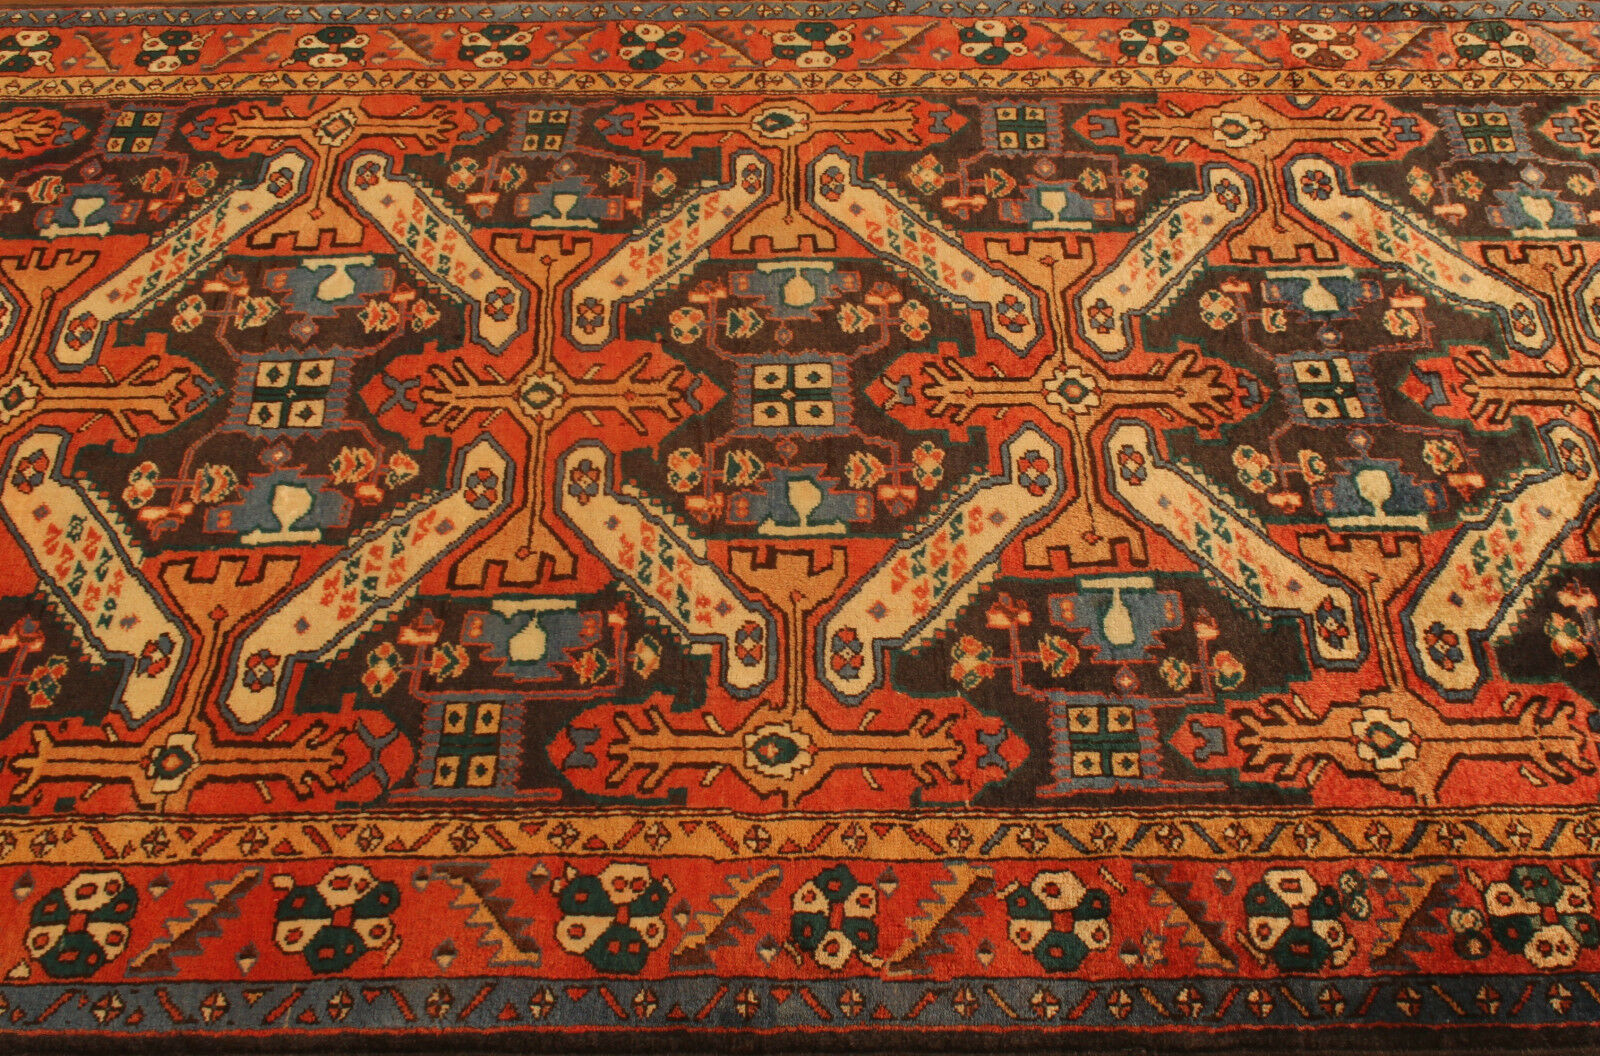 TAPPETO Orientale Vero Annodato Tapis persan alfiere alfiere alfiere 3907 (297 x 133) cm ca2dde